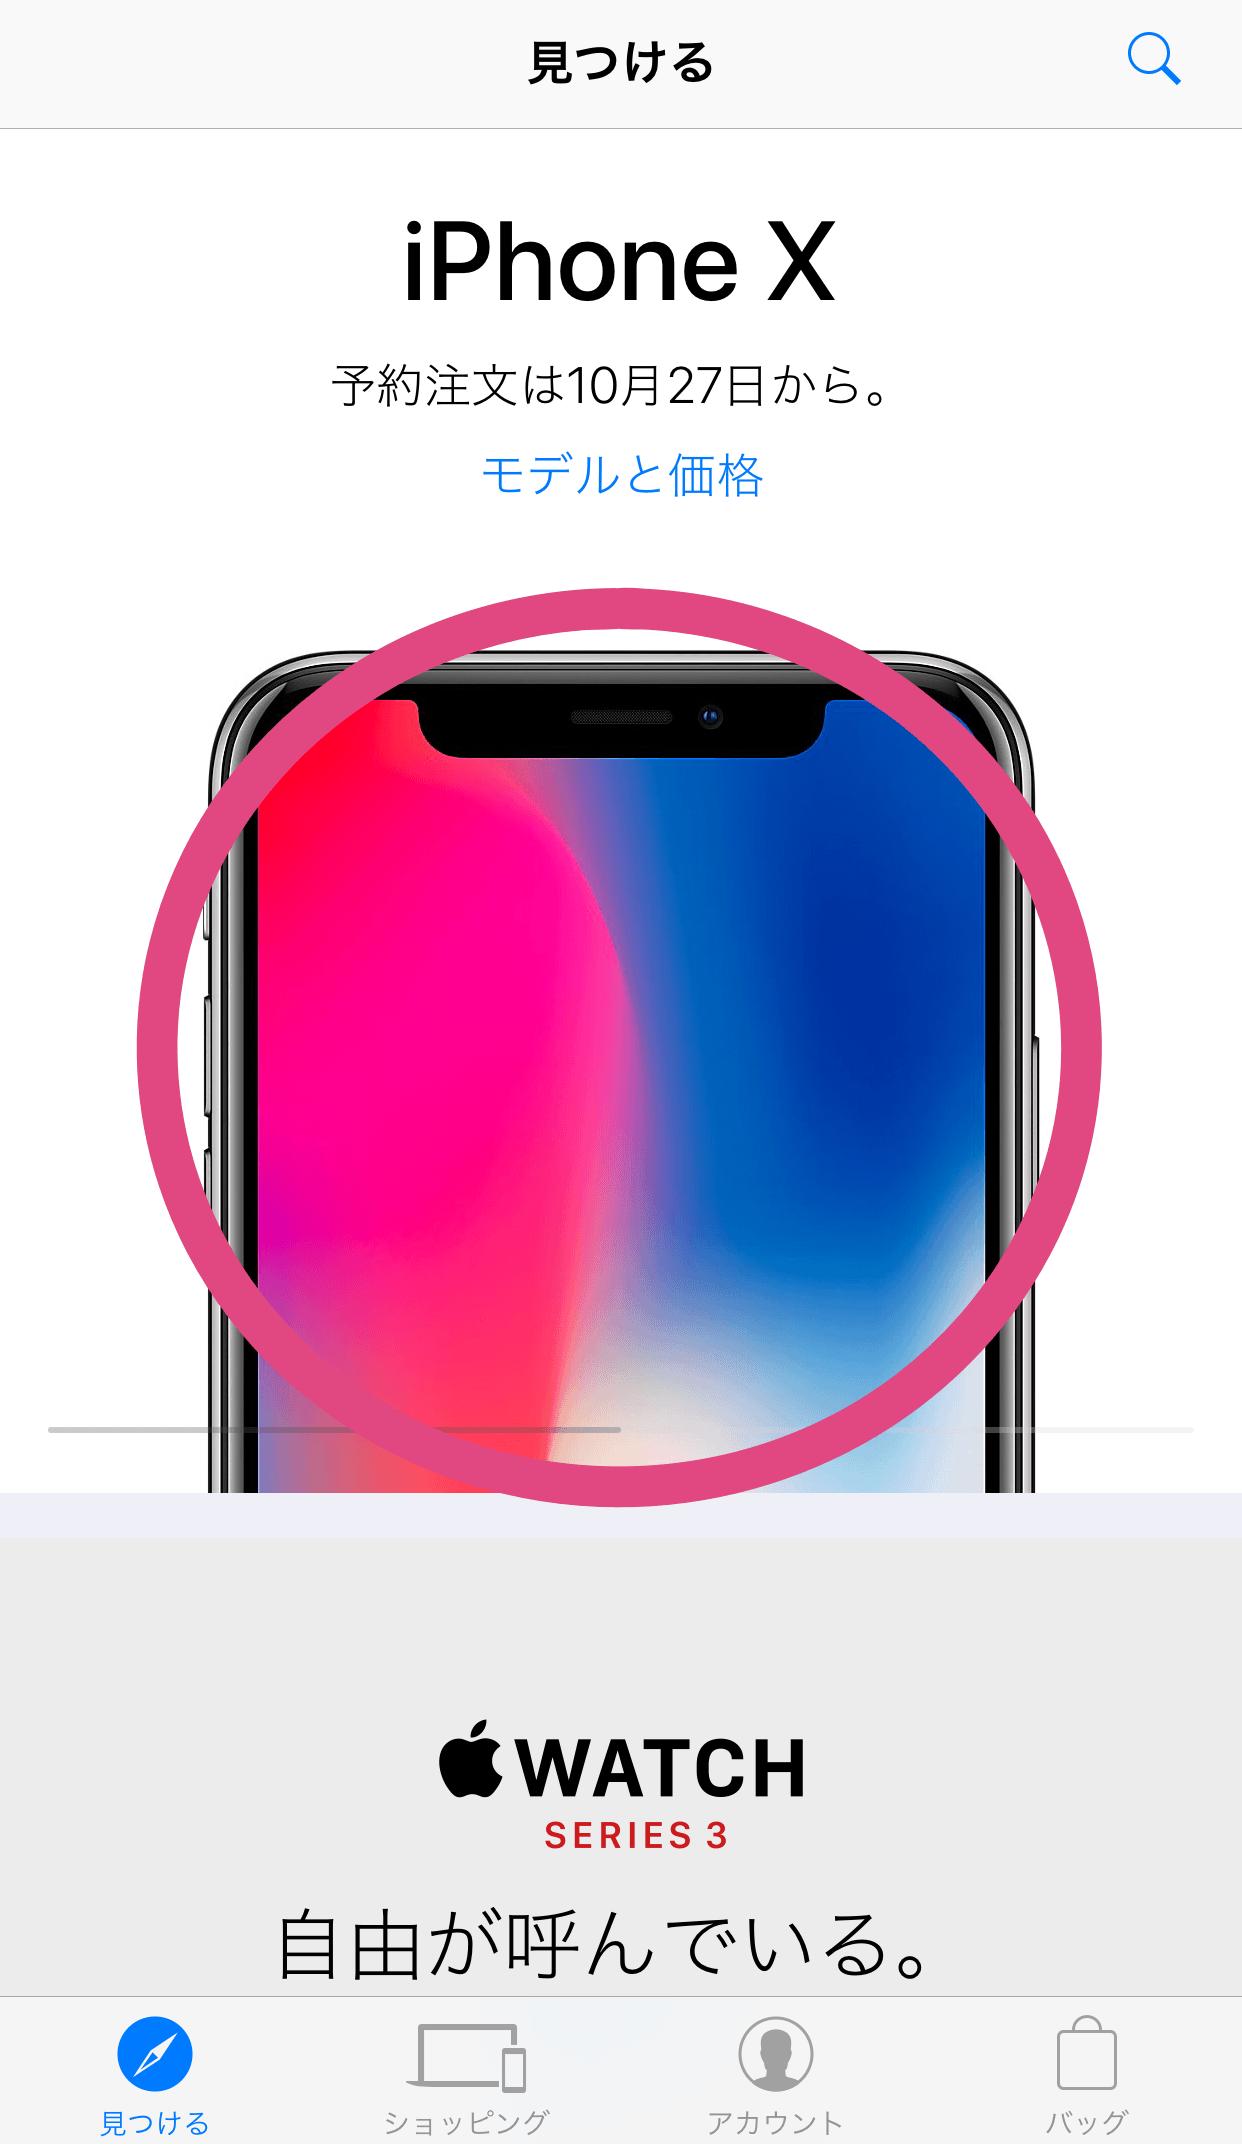 IPhoneX AppStoreYoyaku 04